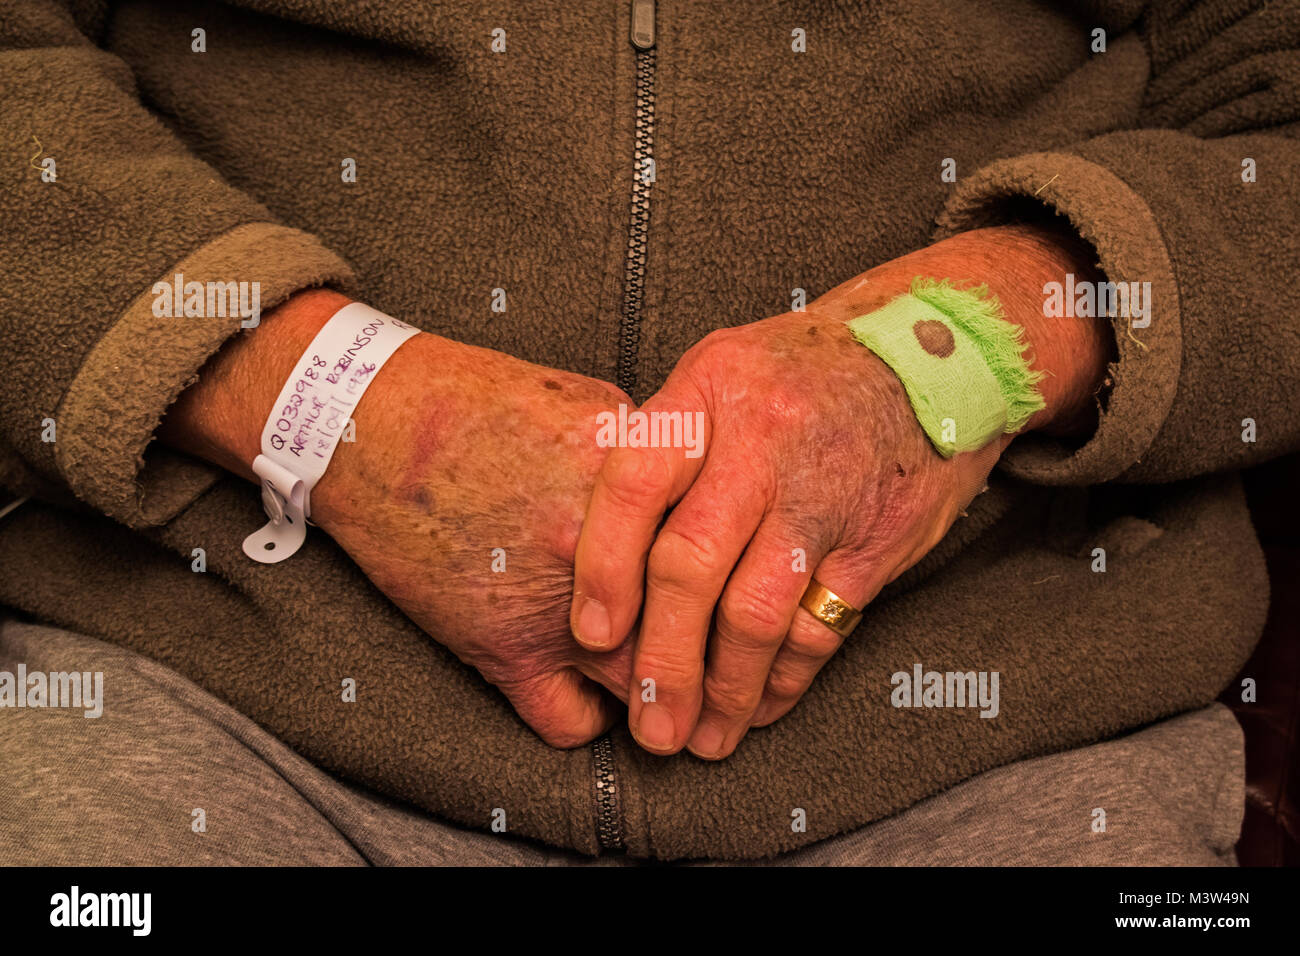 Elderly patient with bruised hands - Stock Image